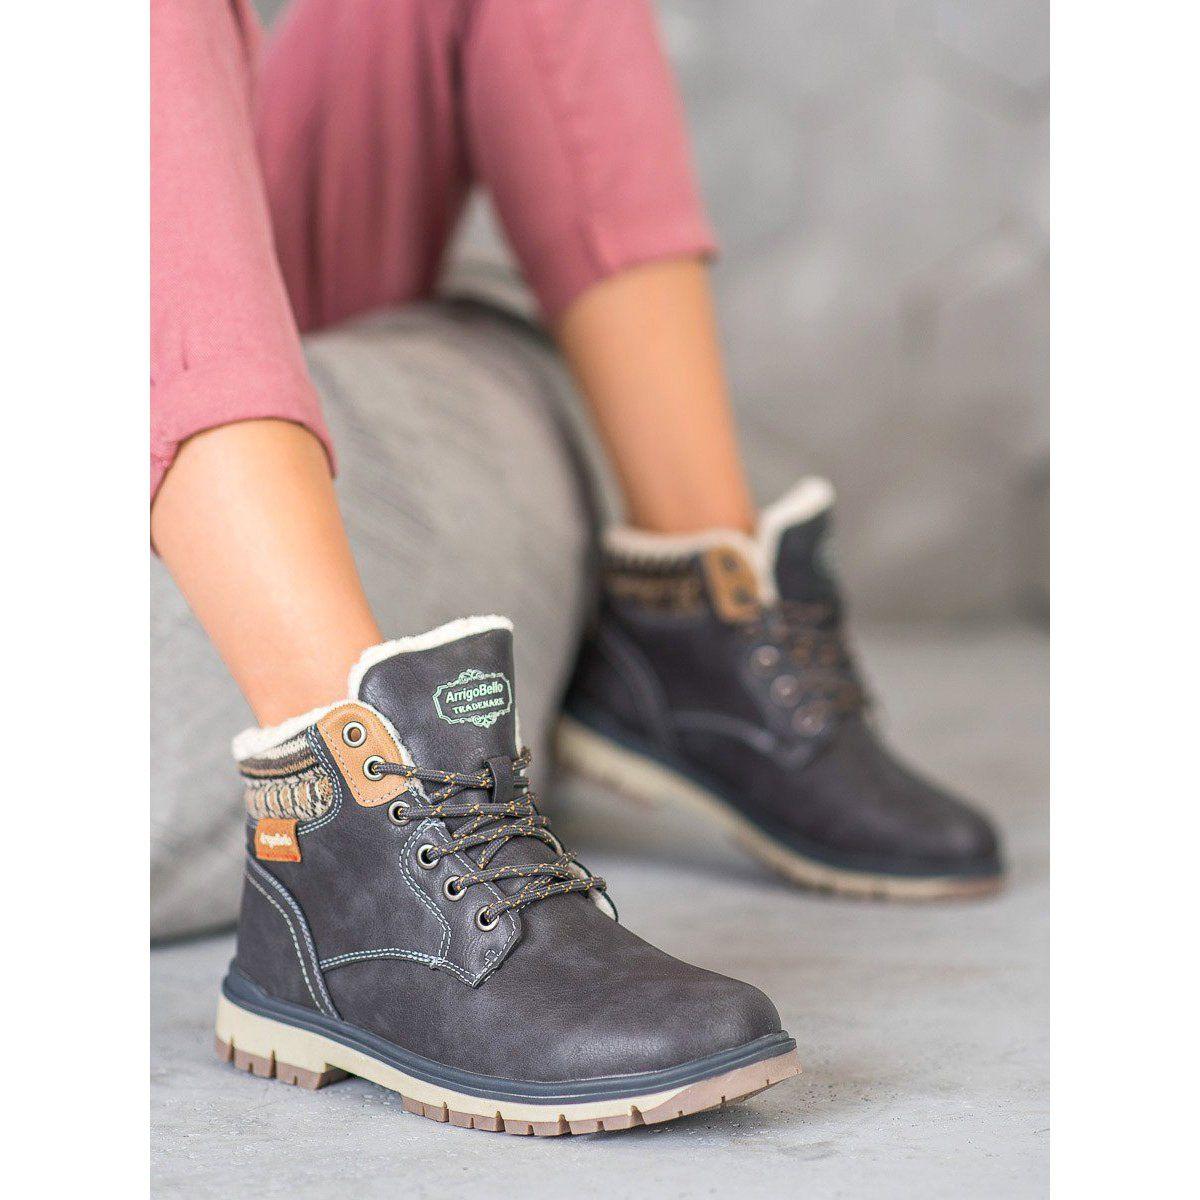 Arrigo Bello Sznurowane Trapery Szare Boots Womens Boots Boot Shoes Women